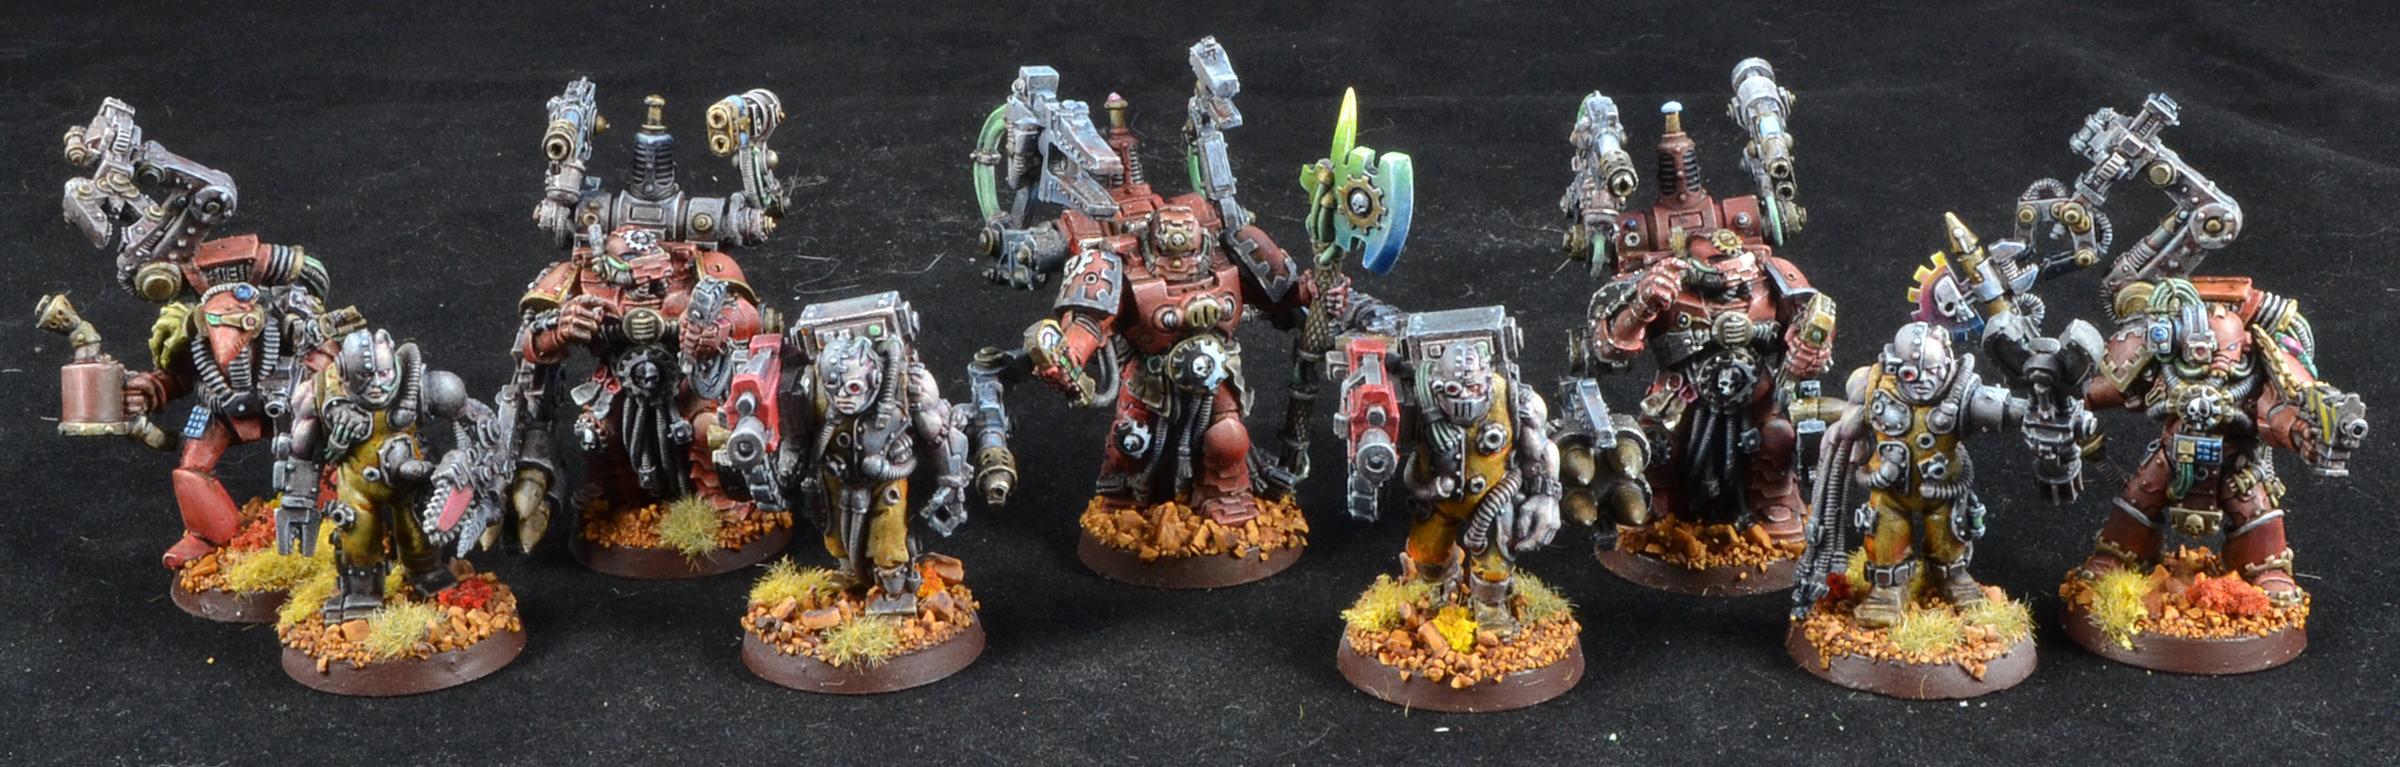 Mantis Warriors, Servitors, Space Marines, Tech Marines, Warhammer 40,000, Weetyskemian44